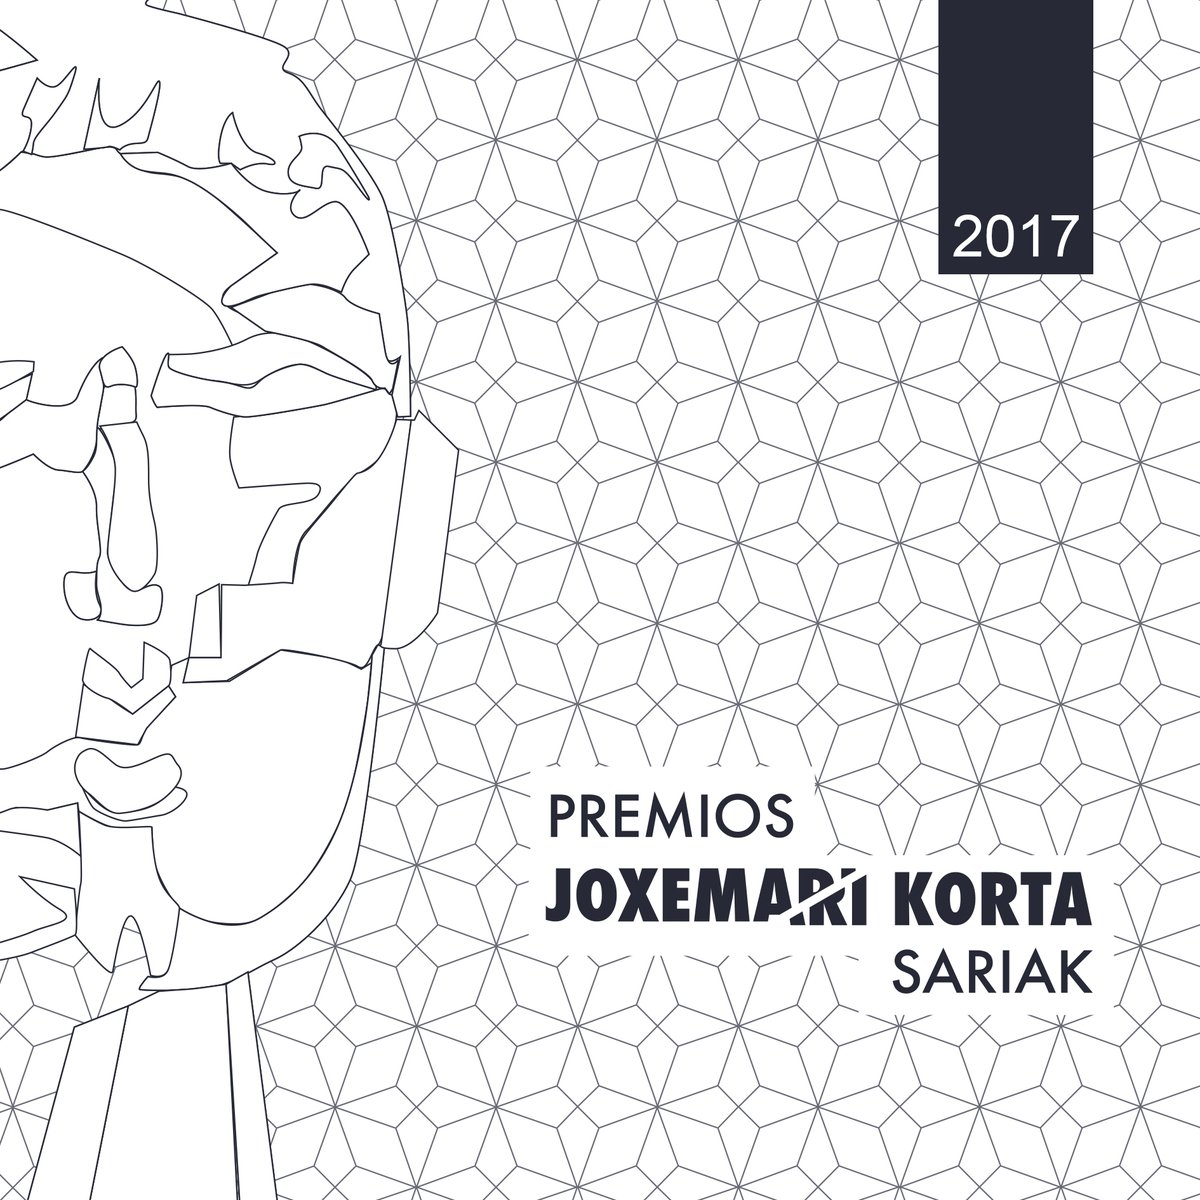 Irekia Eusko Jaurlaritza - Gobierno Vasco :: Los Premios Joxe Mari ...